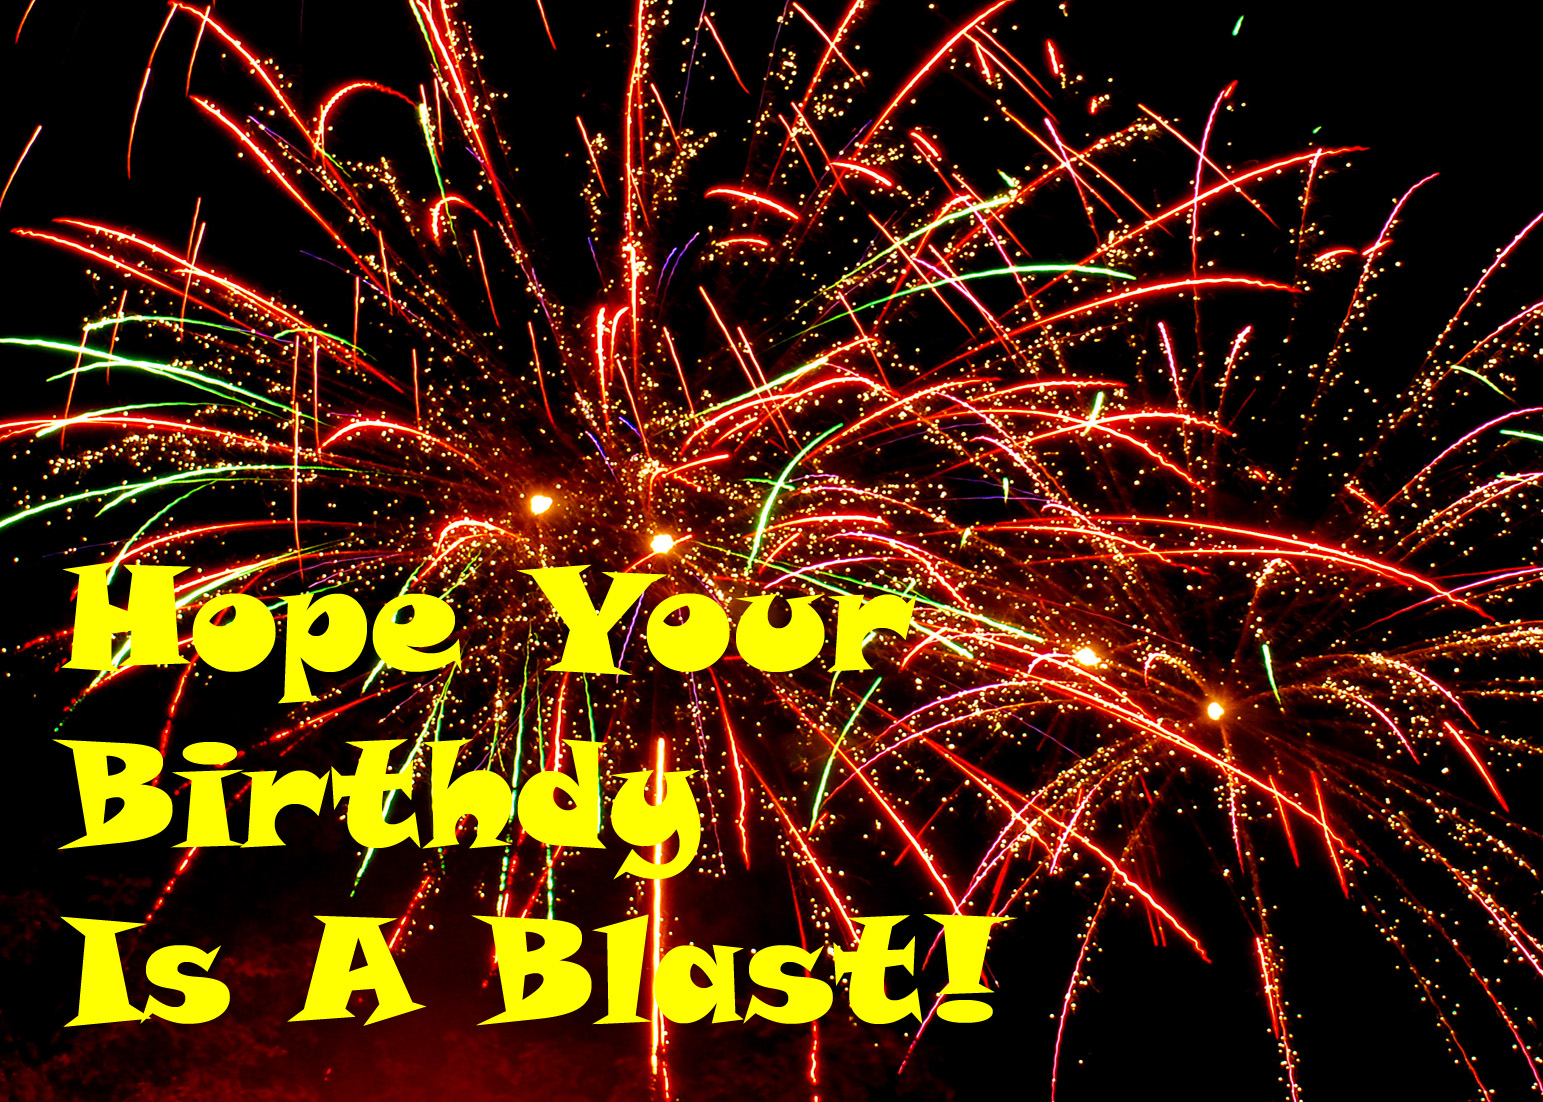 Fireworks clipart happy birthday Fireworks Fireworks_Birthday jpg#Birthday Fireworks Fireworks_Birthday